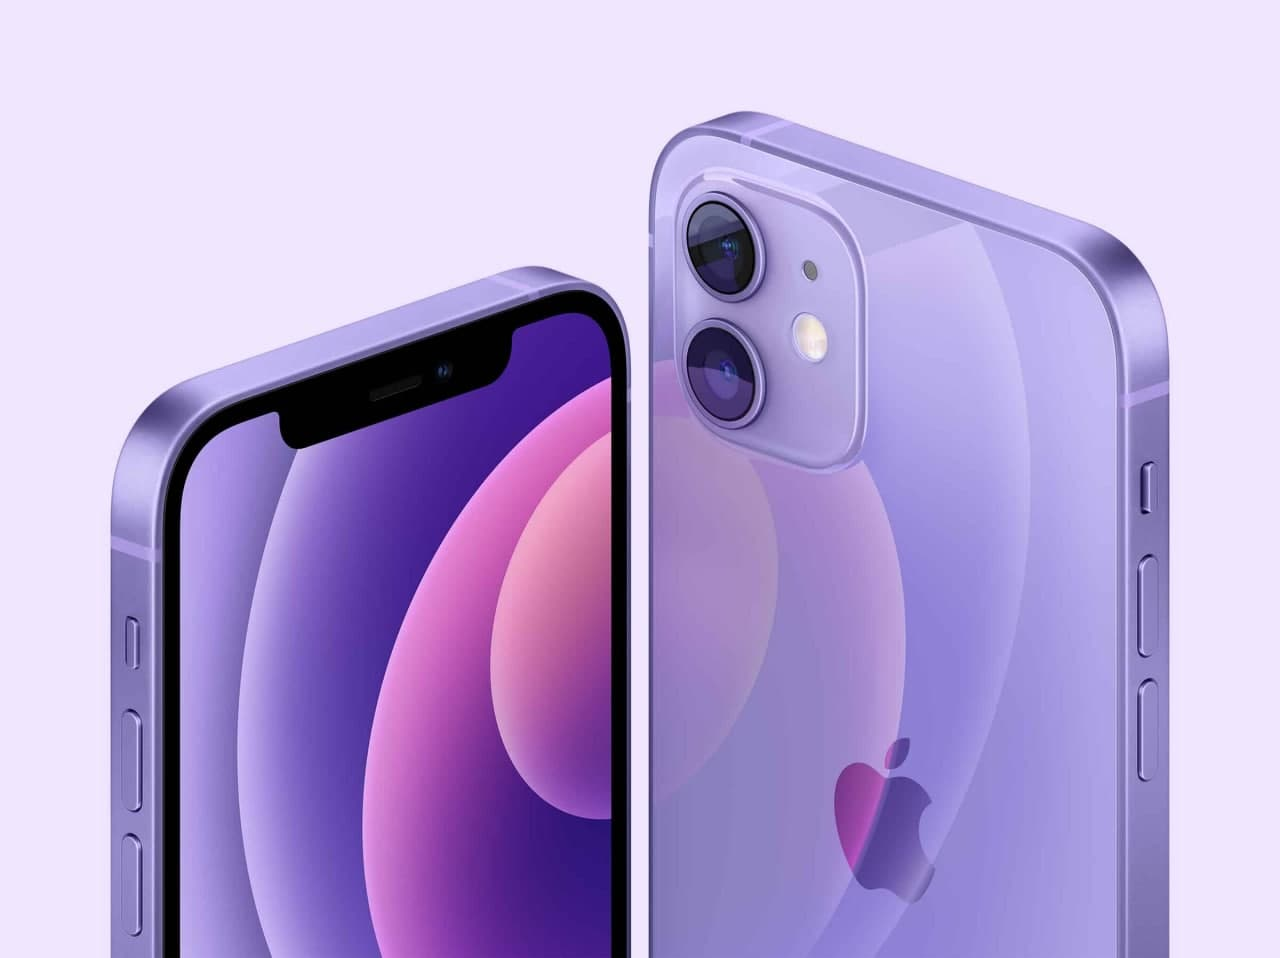 В «Эльдорадо» стартуют продажи фиолетового Айфон 12!